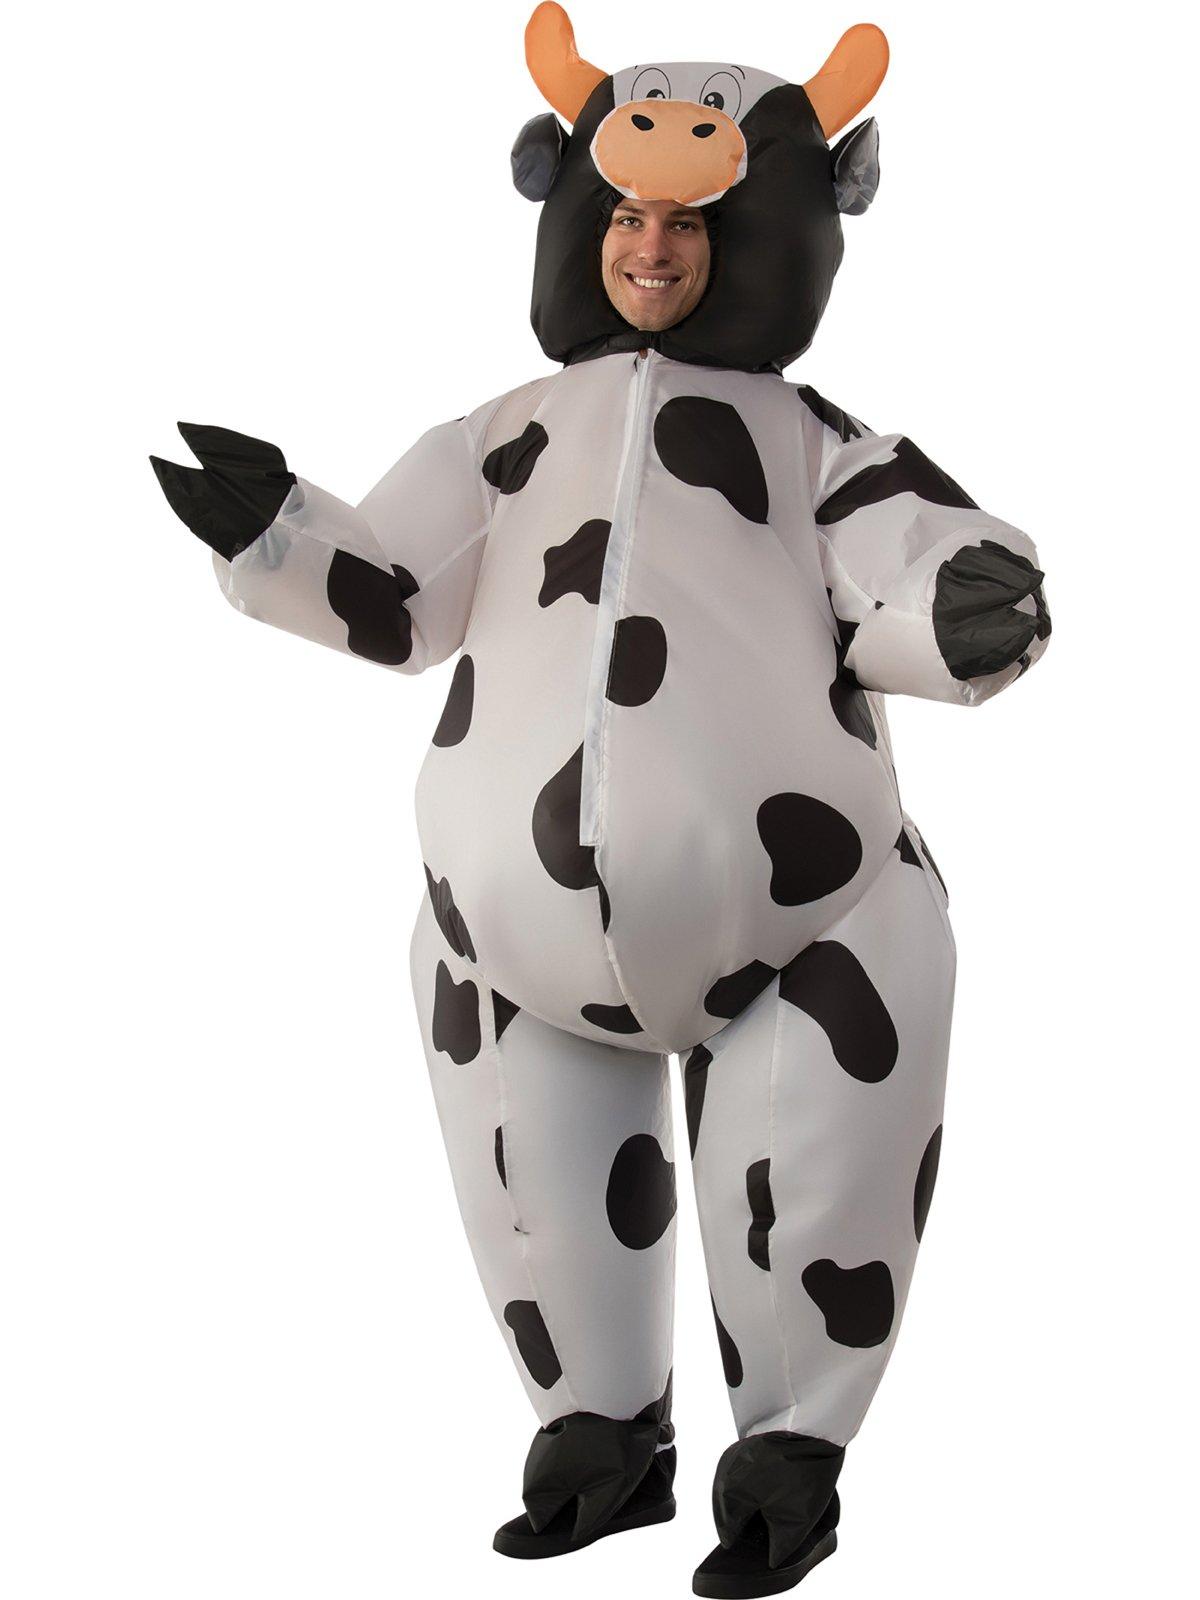 Men's Inflatable Cow Costume, Standard